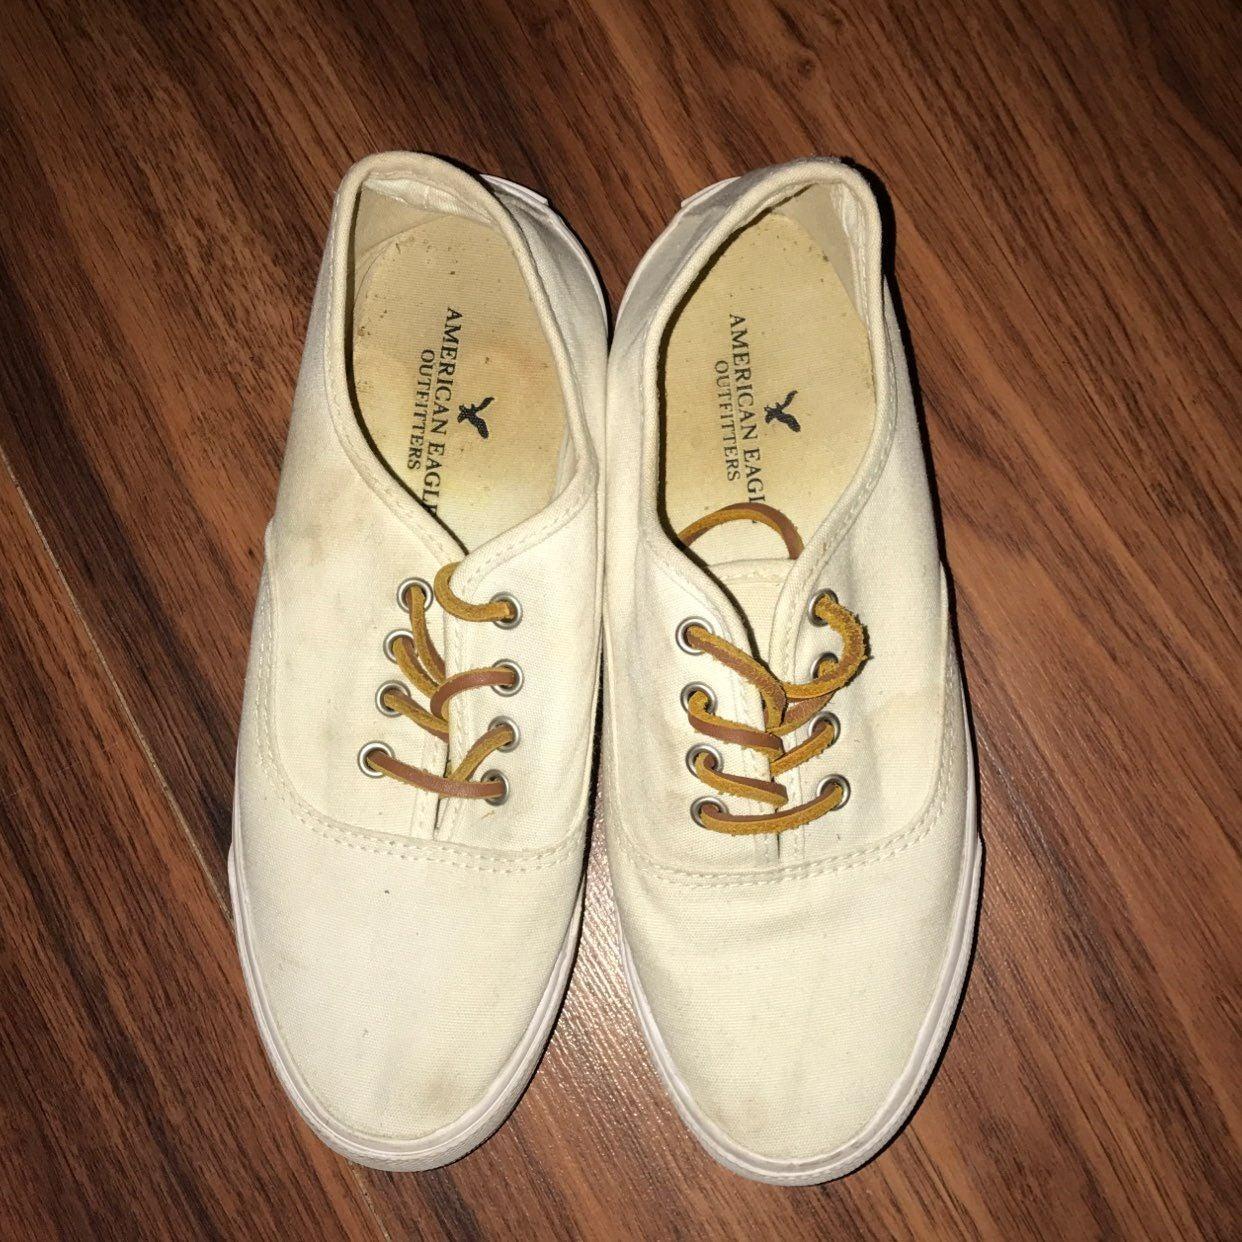 White AE Canvas Shoes